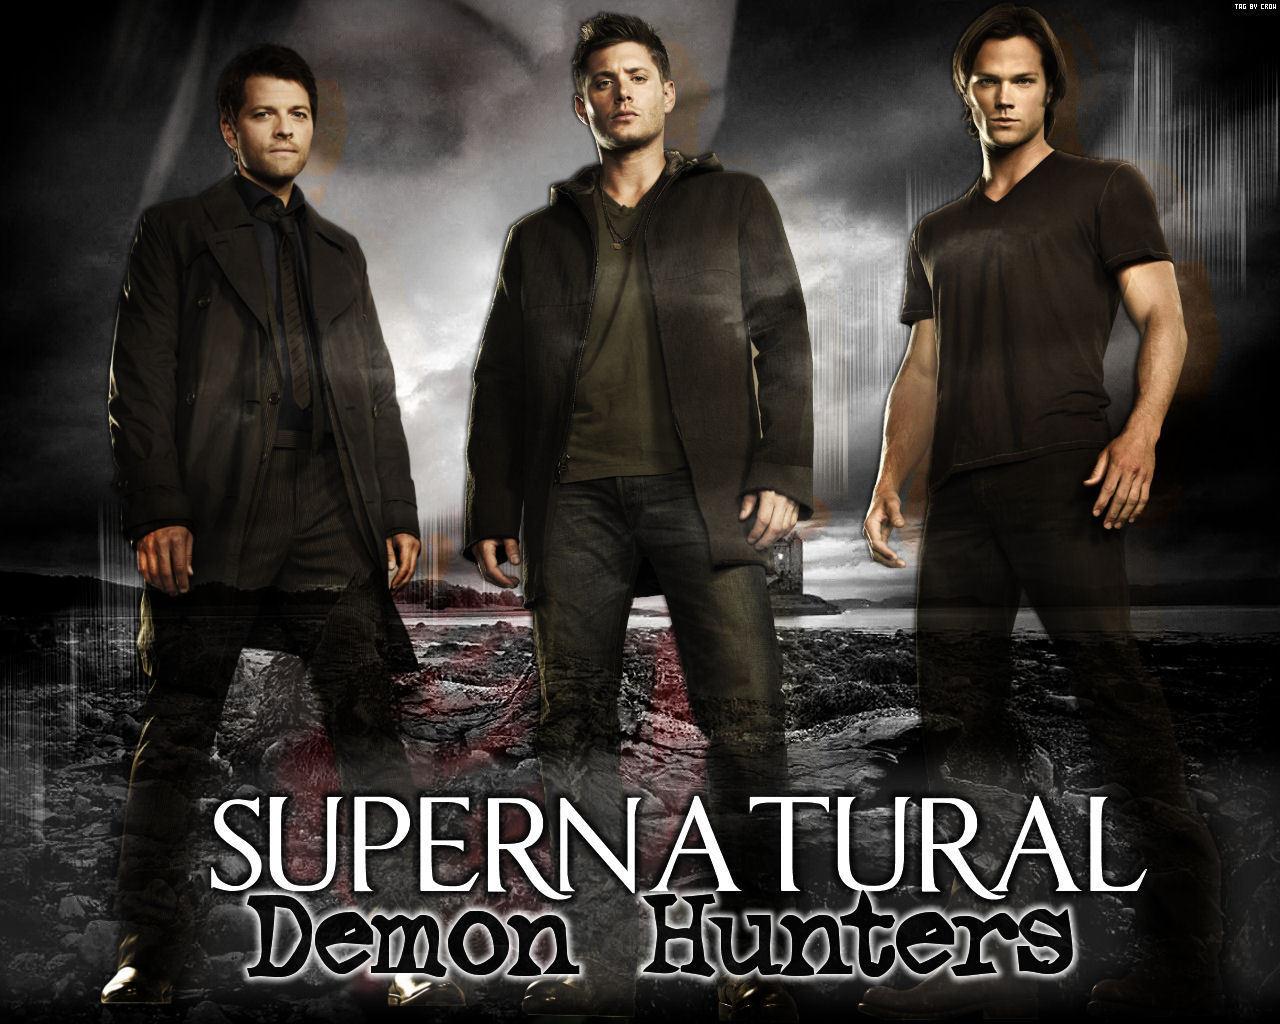 supernatural wallpaper supernatural supernatural wallpaper 1280x1024